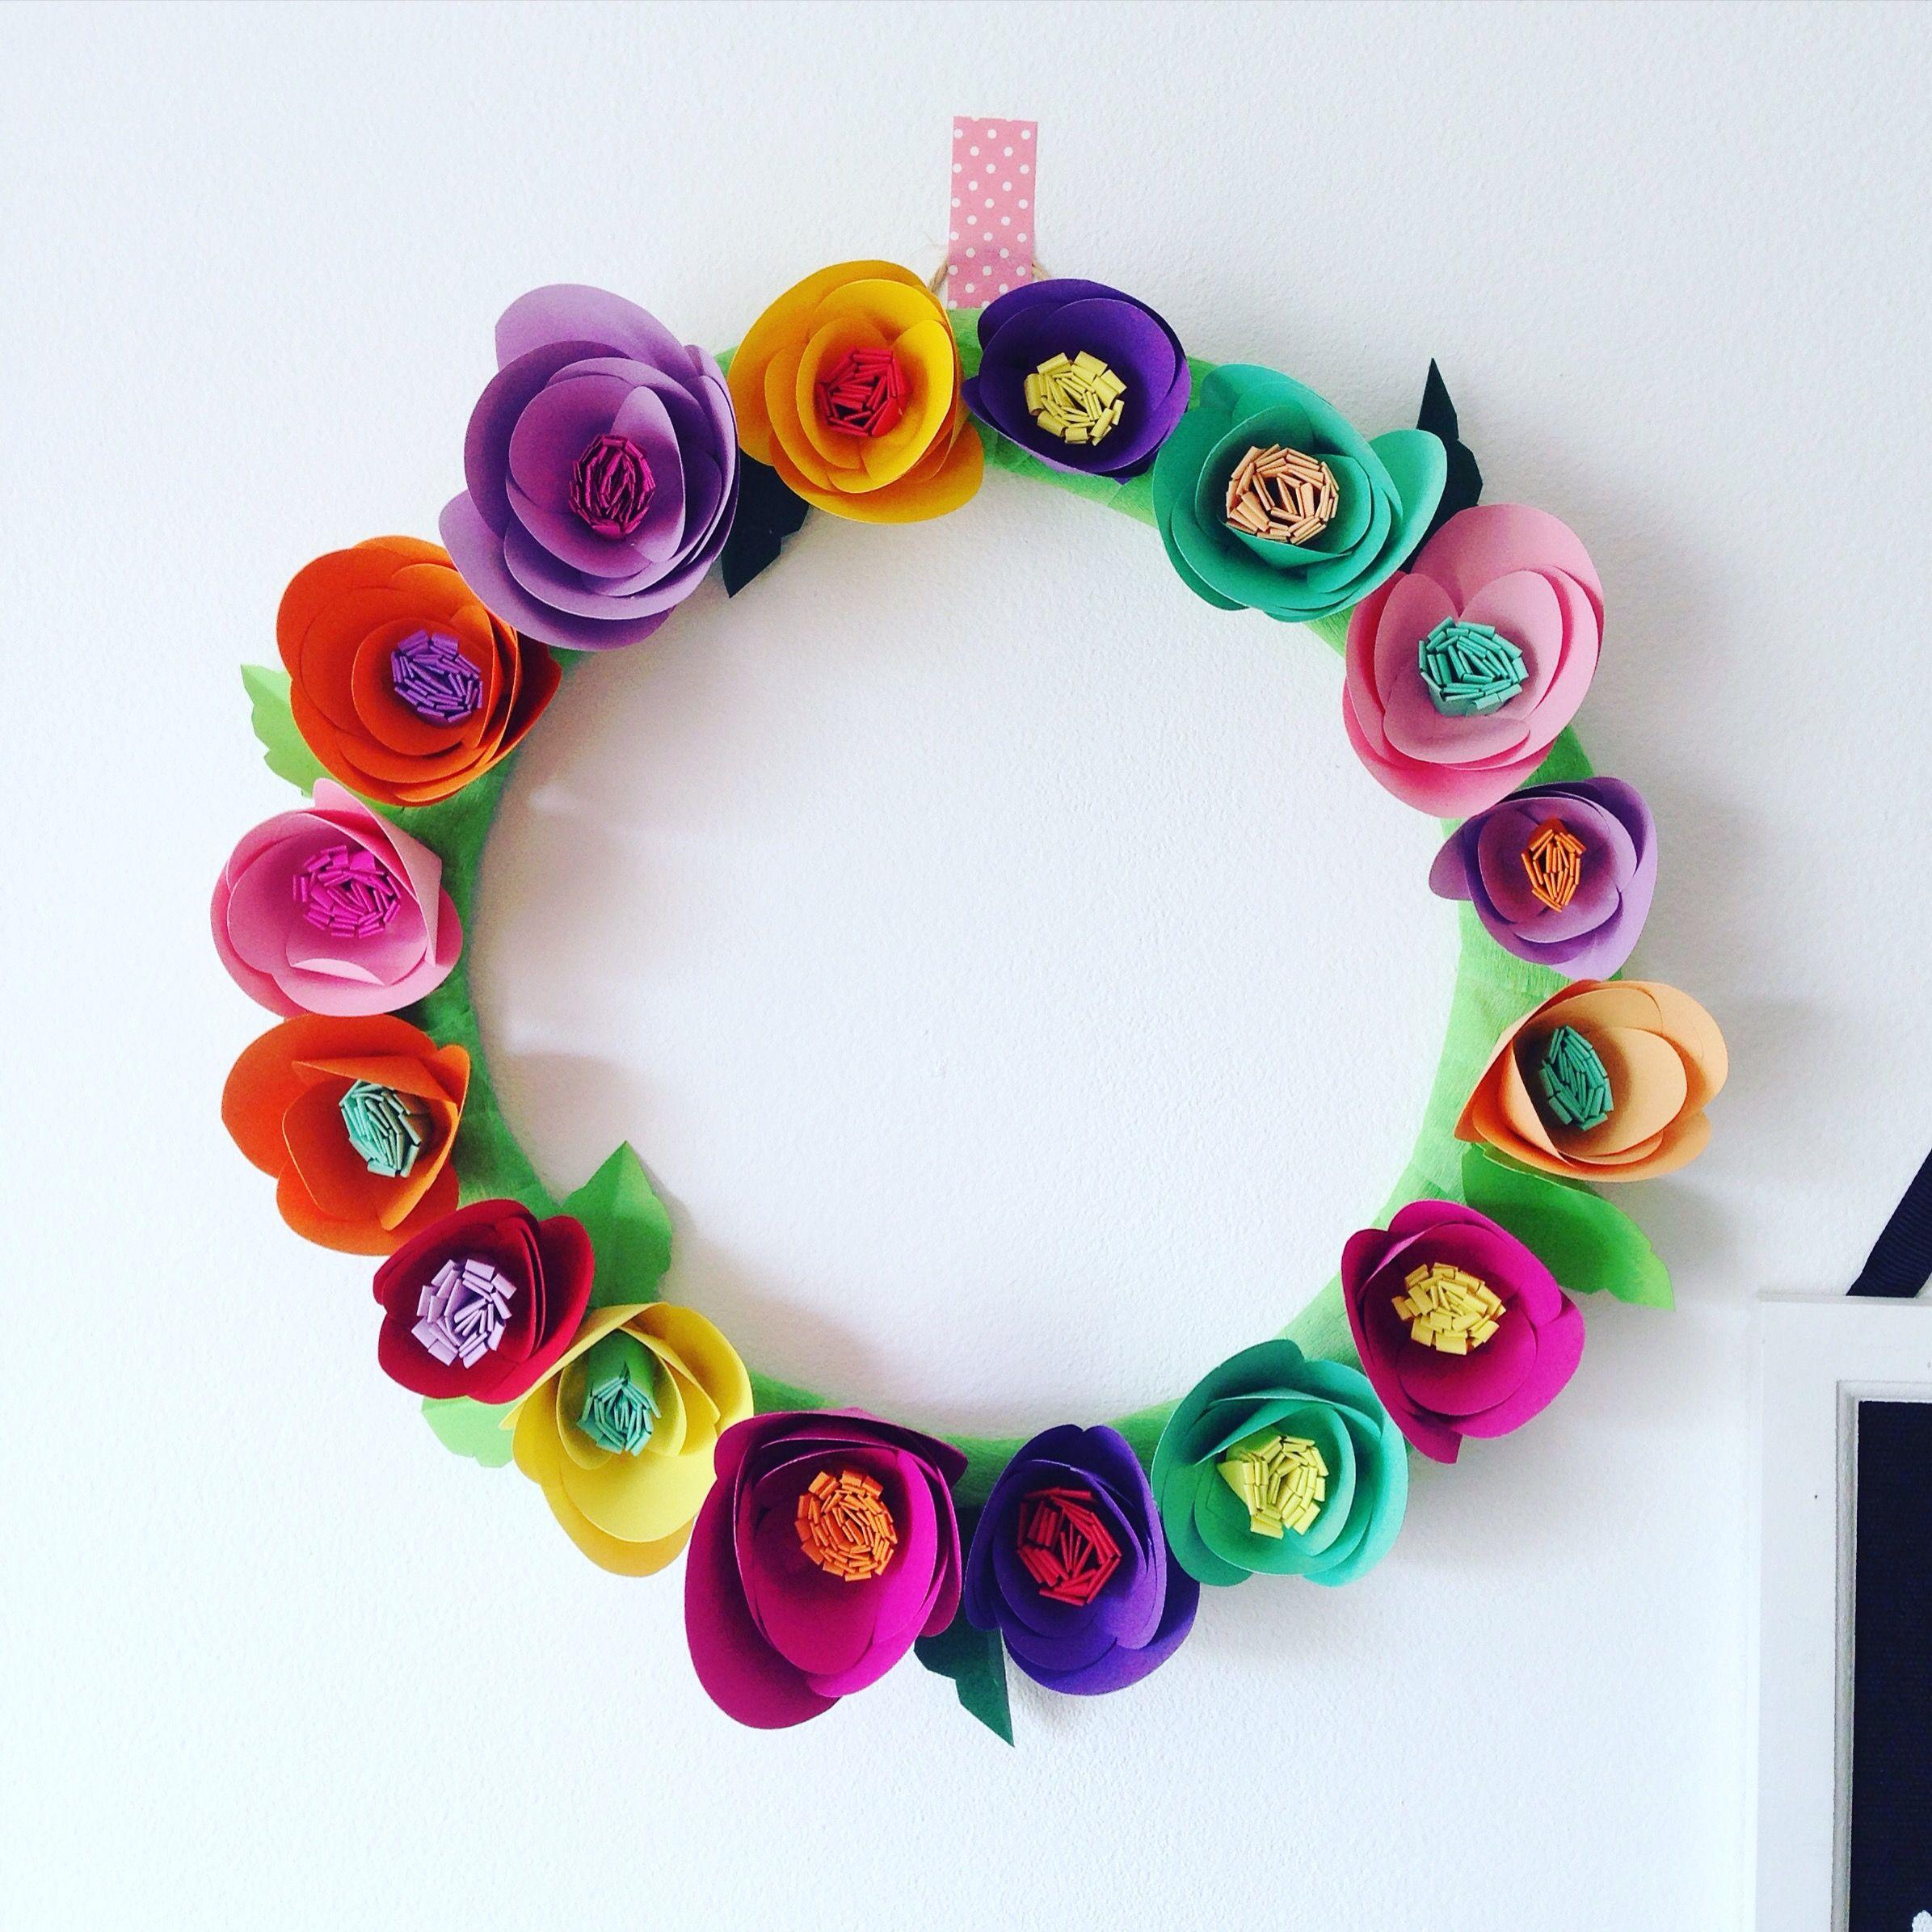 Diy Paper Flowers Wreath Paper Crafts Paper Flowers Diy Paper